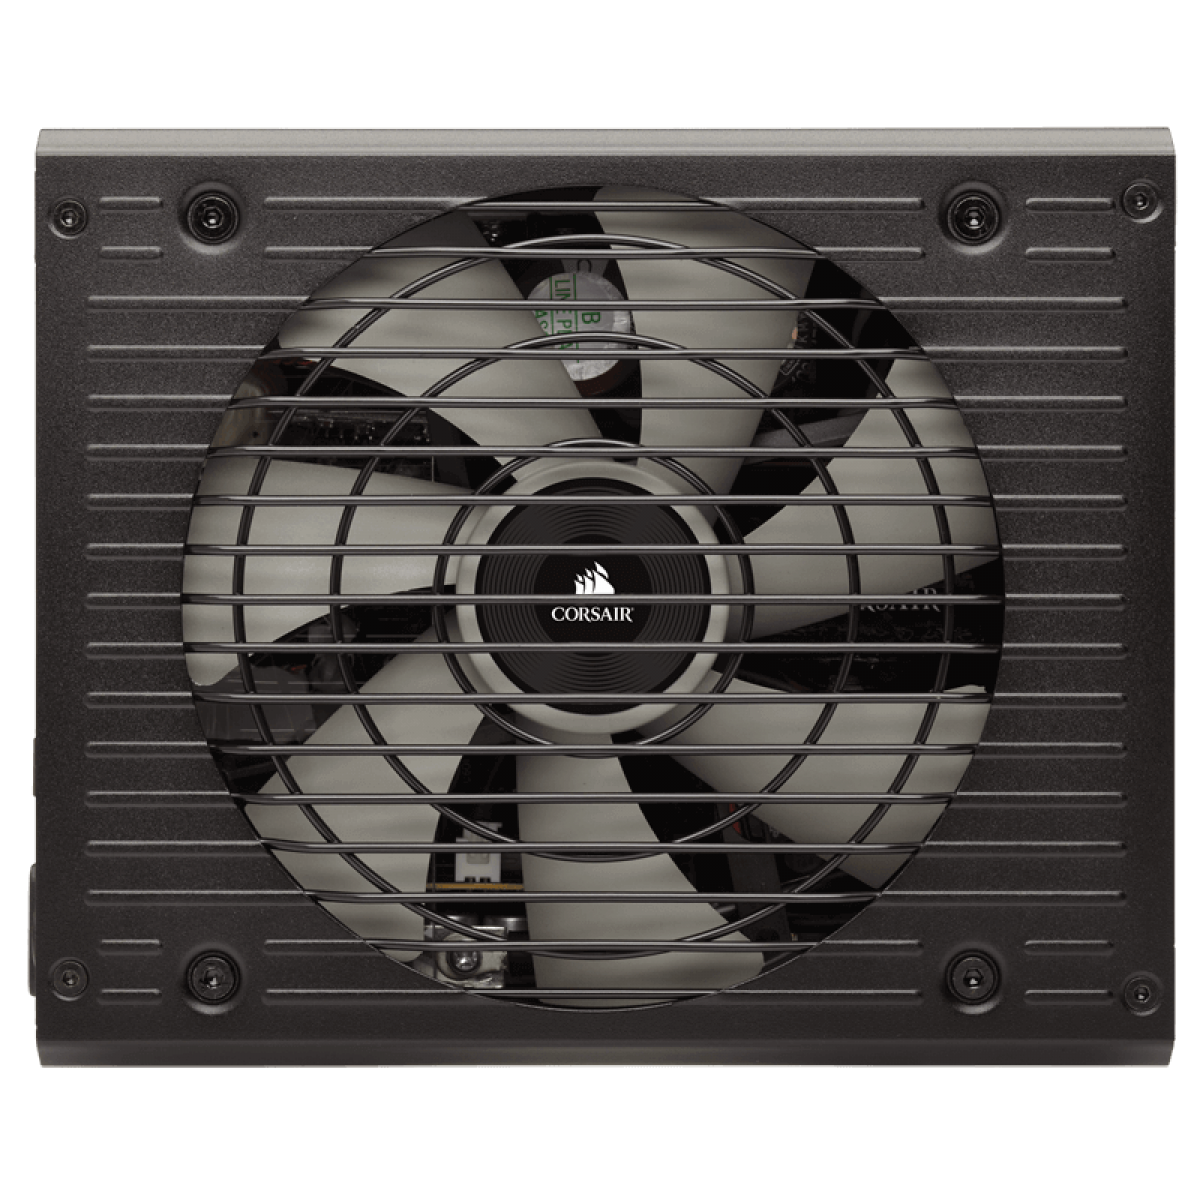 Fonte Corsair HX750 750W 80 Plus Platinum PFC Ativo Modular CP-9020137-WW